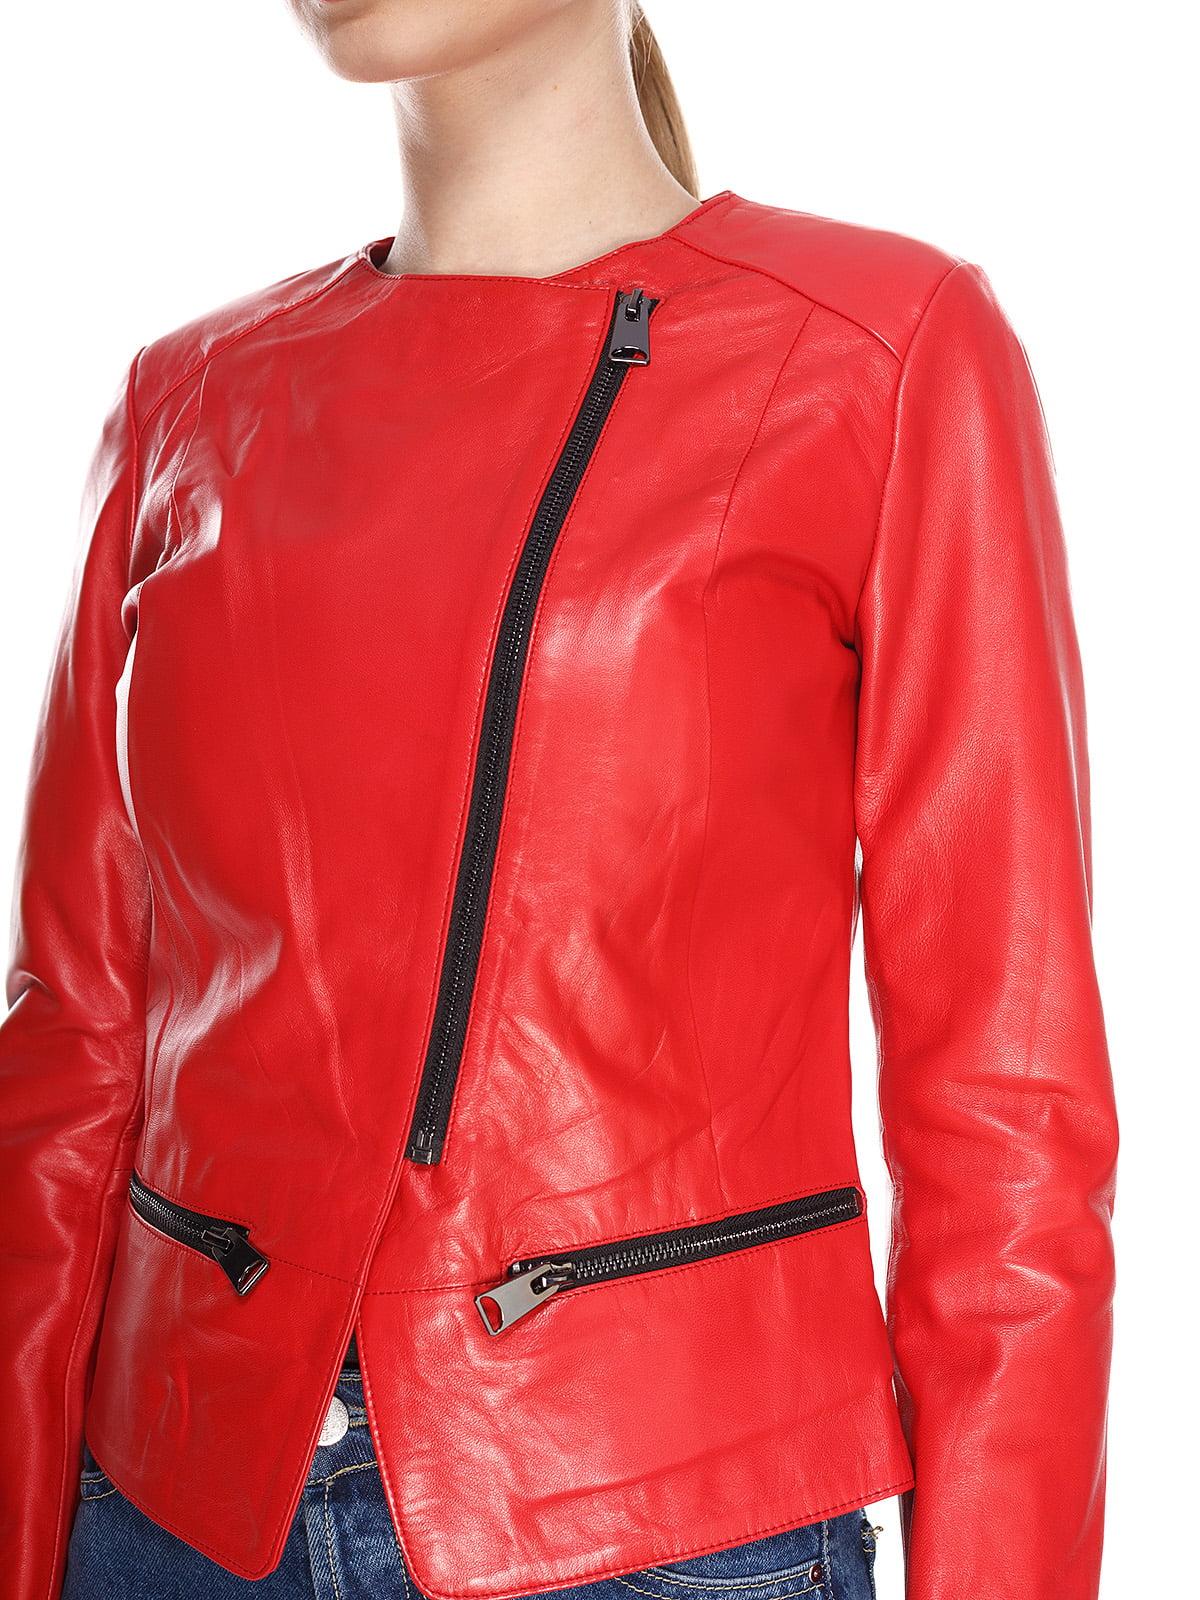 Куртка червона   4191405   фото 3